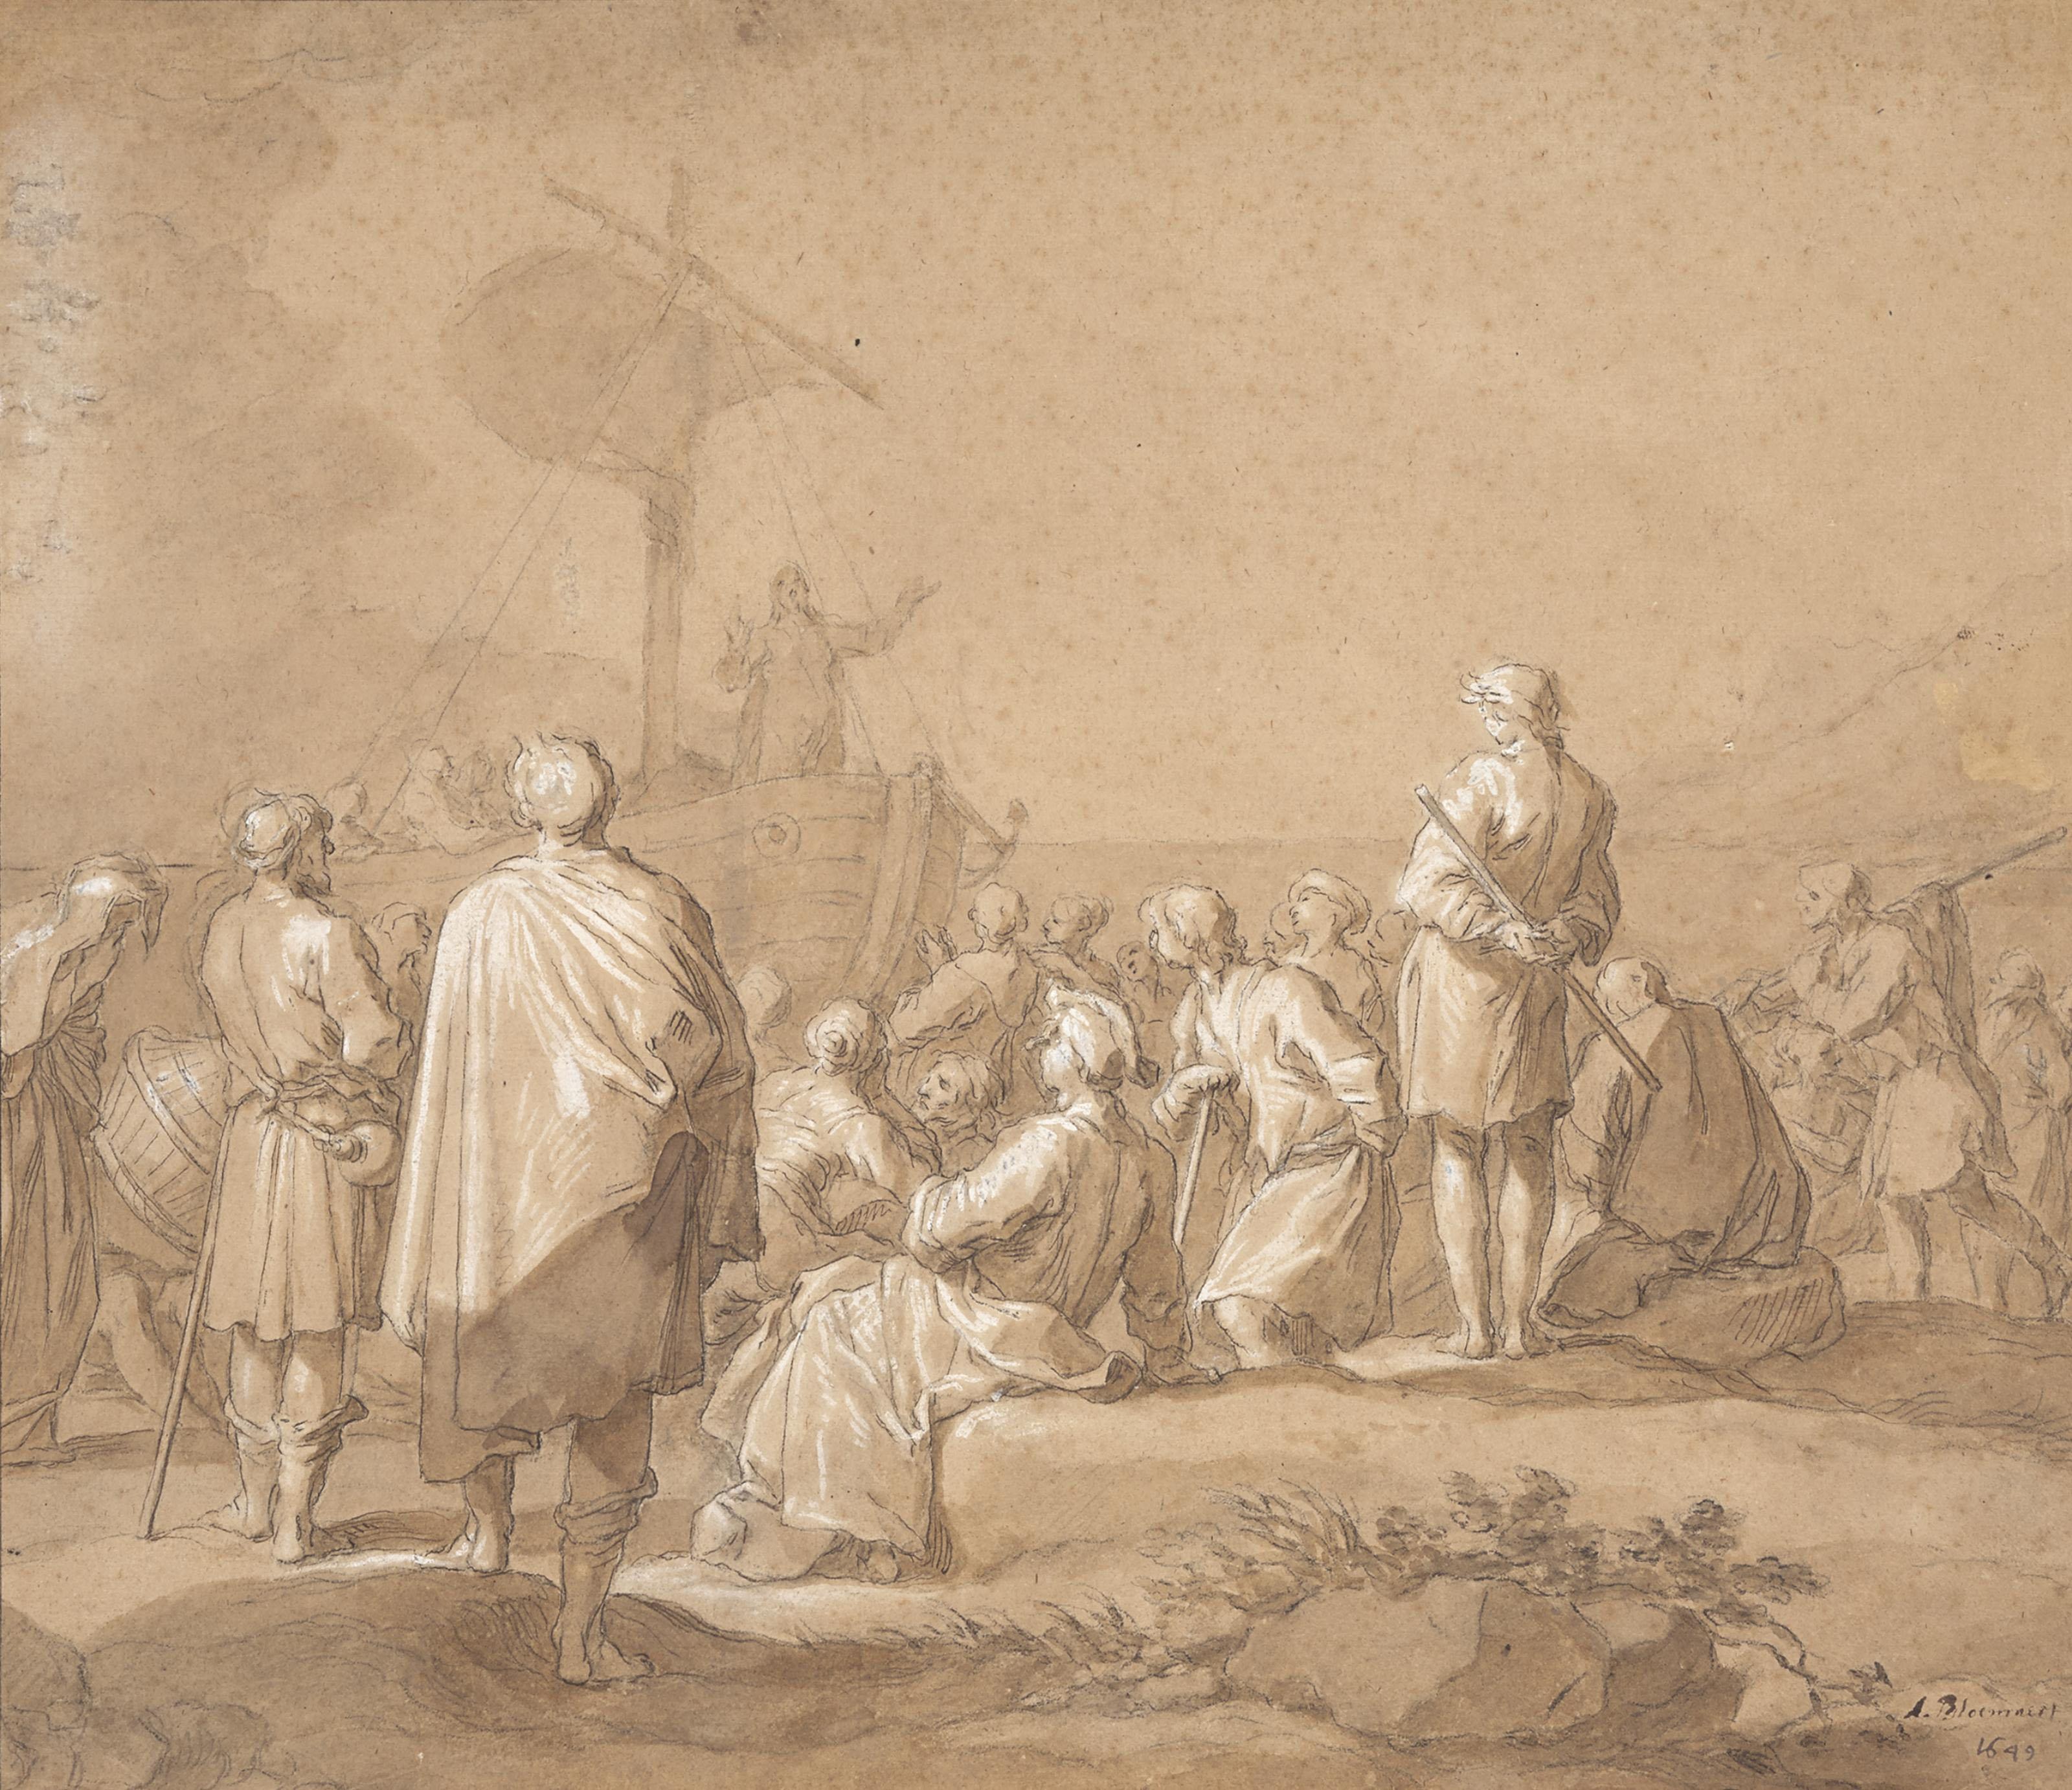 Abraham BLOEMAERT (Gorinchem 1